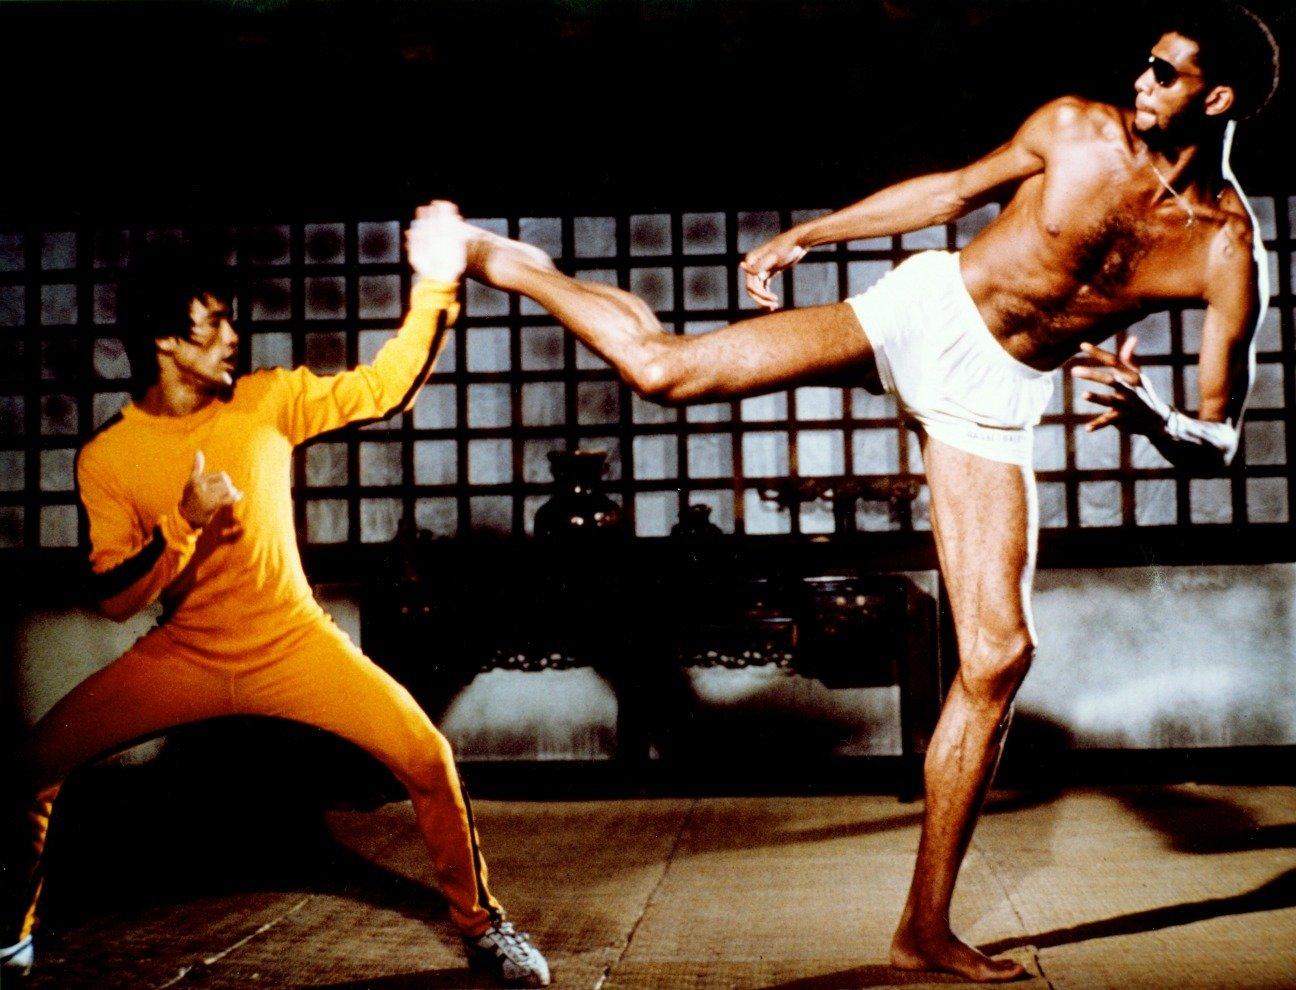 Dalam film terbaru Quentin Tarantino, Bruce Lee digambarkan sebagai pria China congkak. Bintang NBA Kareem Abdul Jabar emosi.